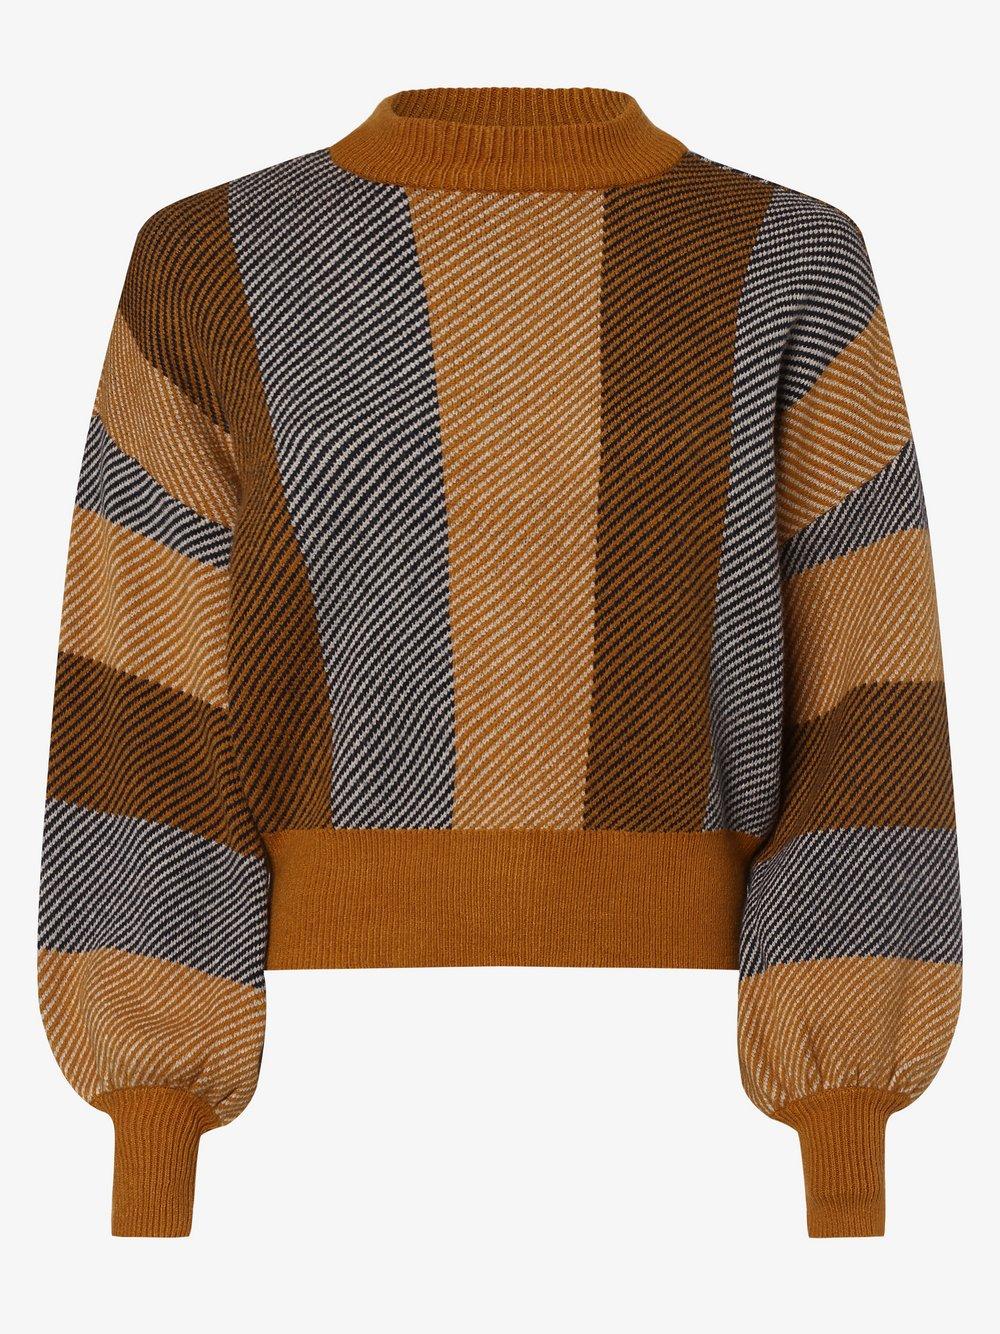 Y.A.S - Sweter damski – Yasharper, brązowy